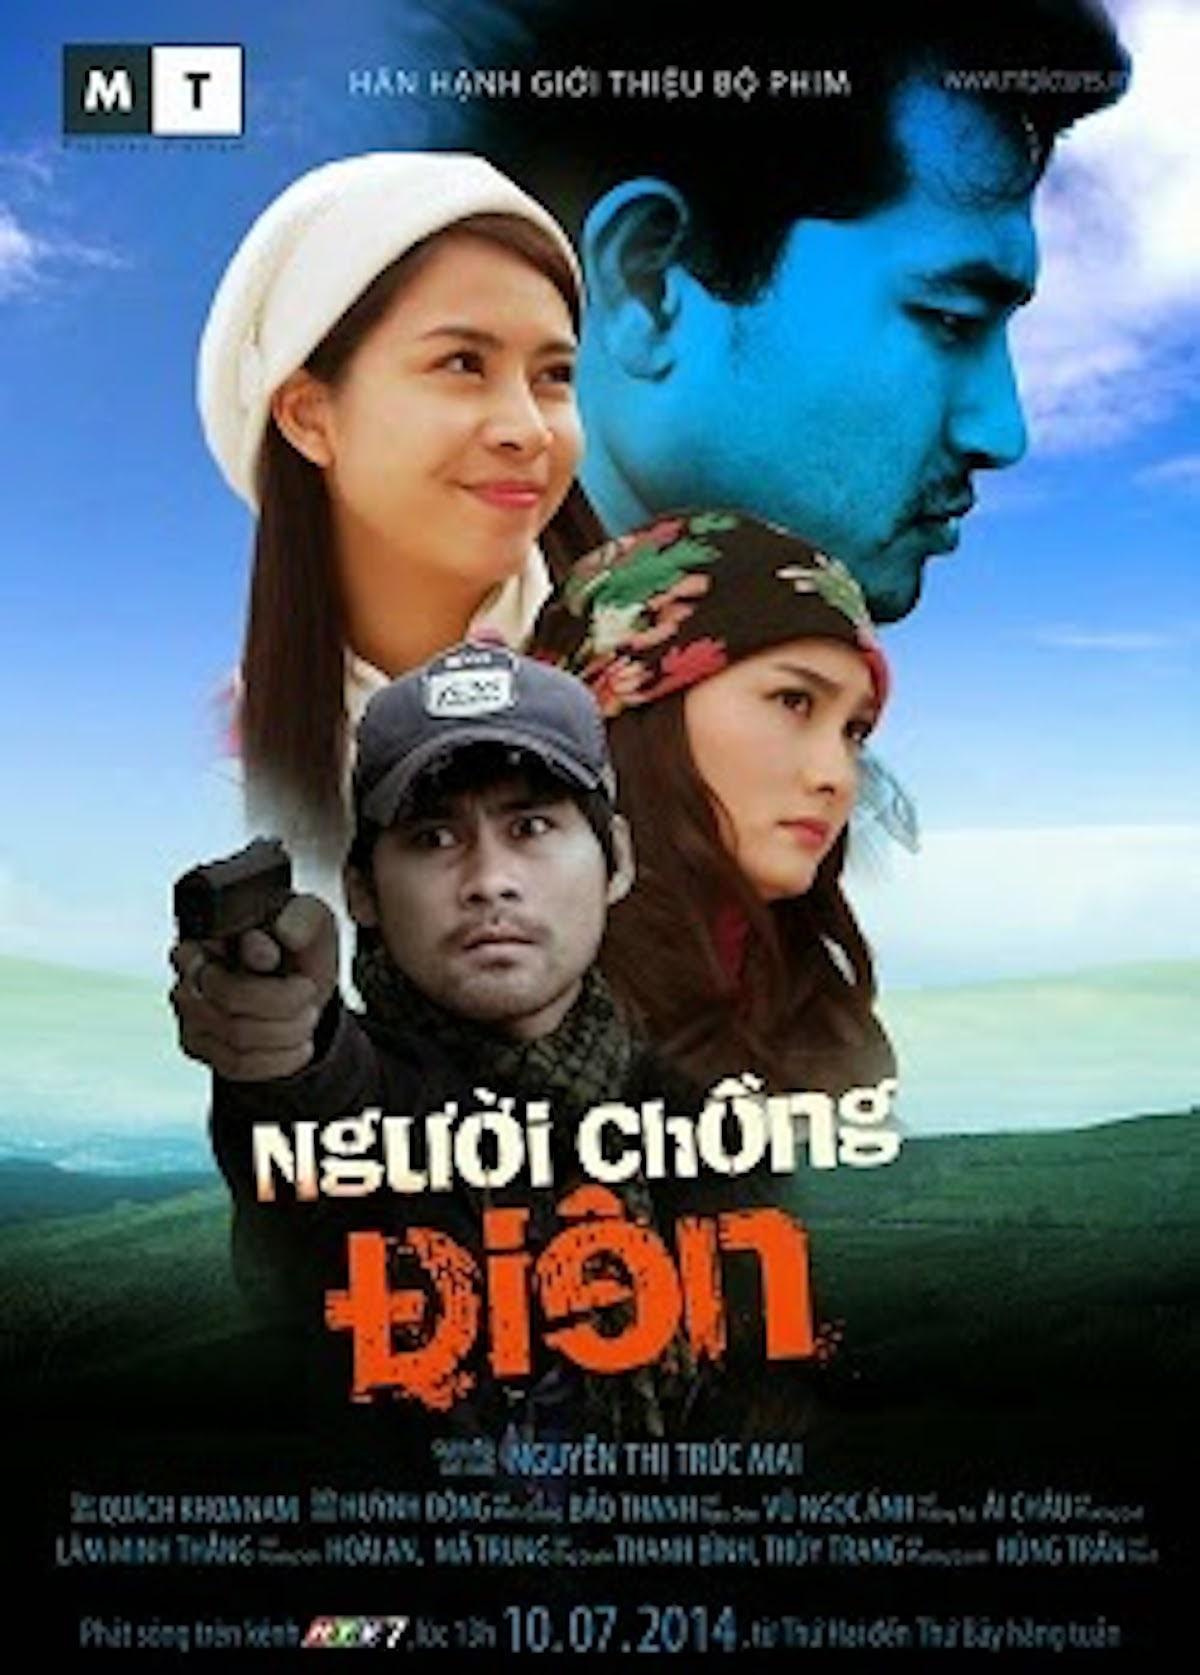 VietnameseTVseries4